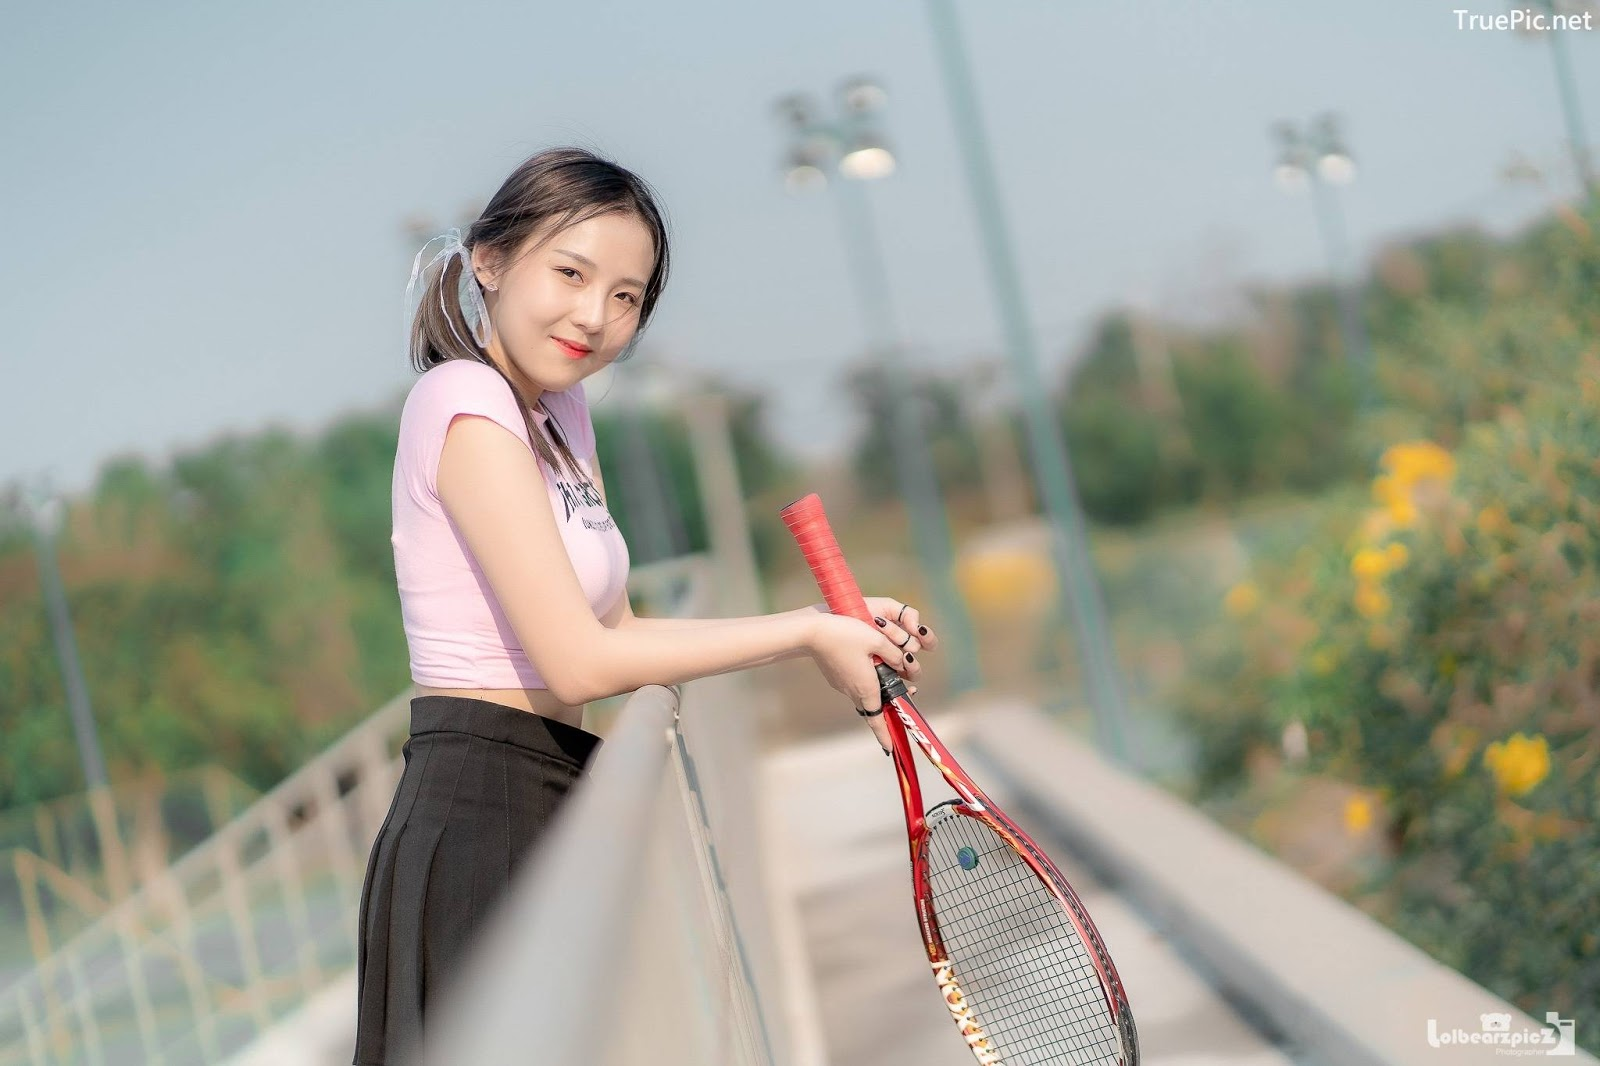 Image Thailand Model - Pattanan Truengjitrarat - Cute Sports Girl - TruePic.net - Picture-7